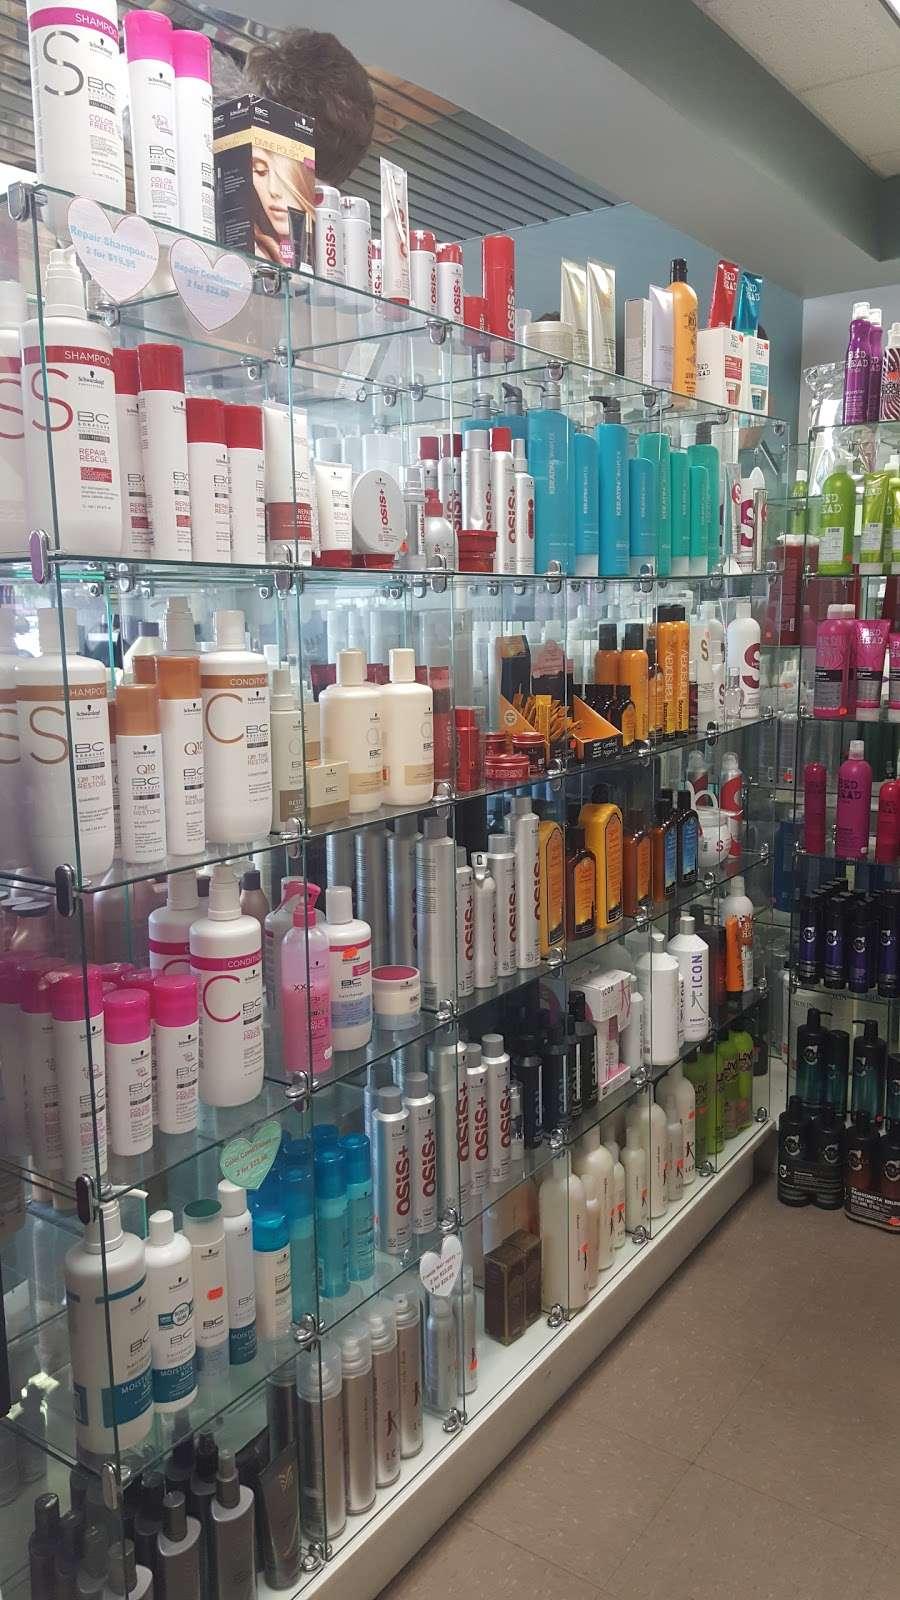 Helens Beauty Supply & Salon - hair care  | Photo 3 of 9 | Address: 15760 La Forge St, Whittier, CA 90603, USA | Phone: (562) 943-7313